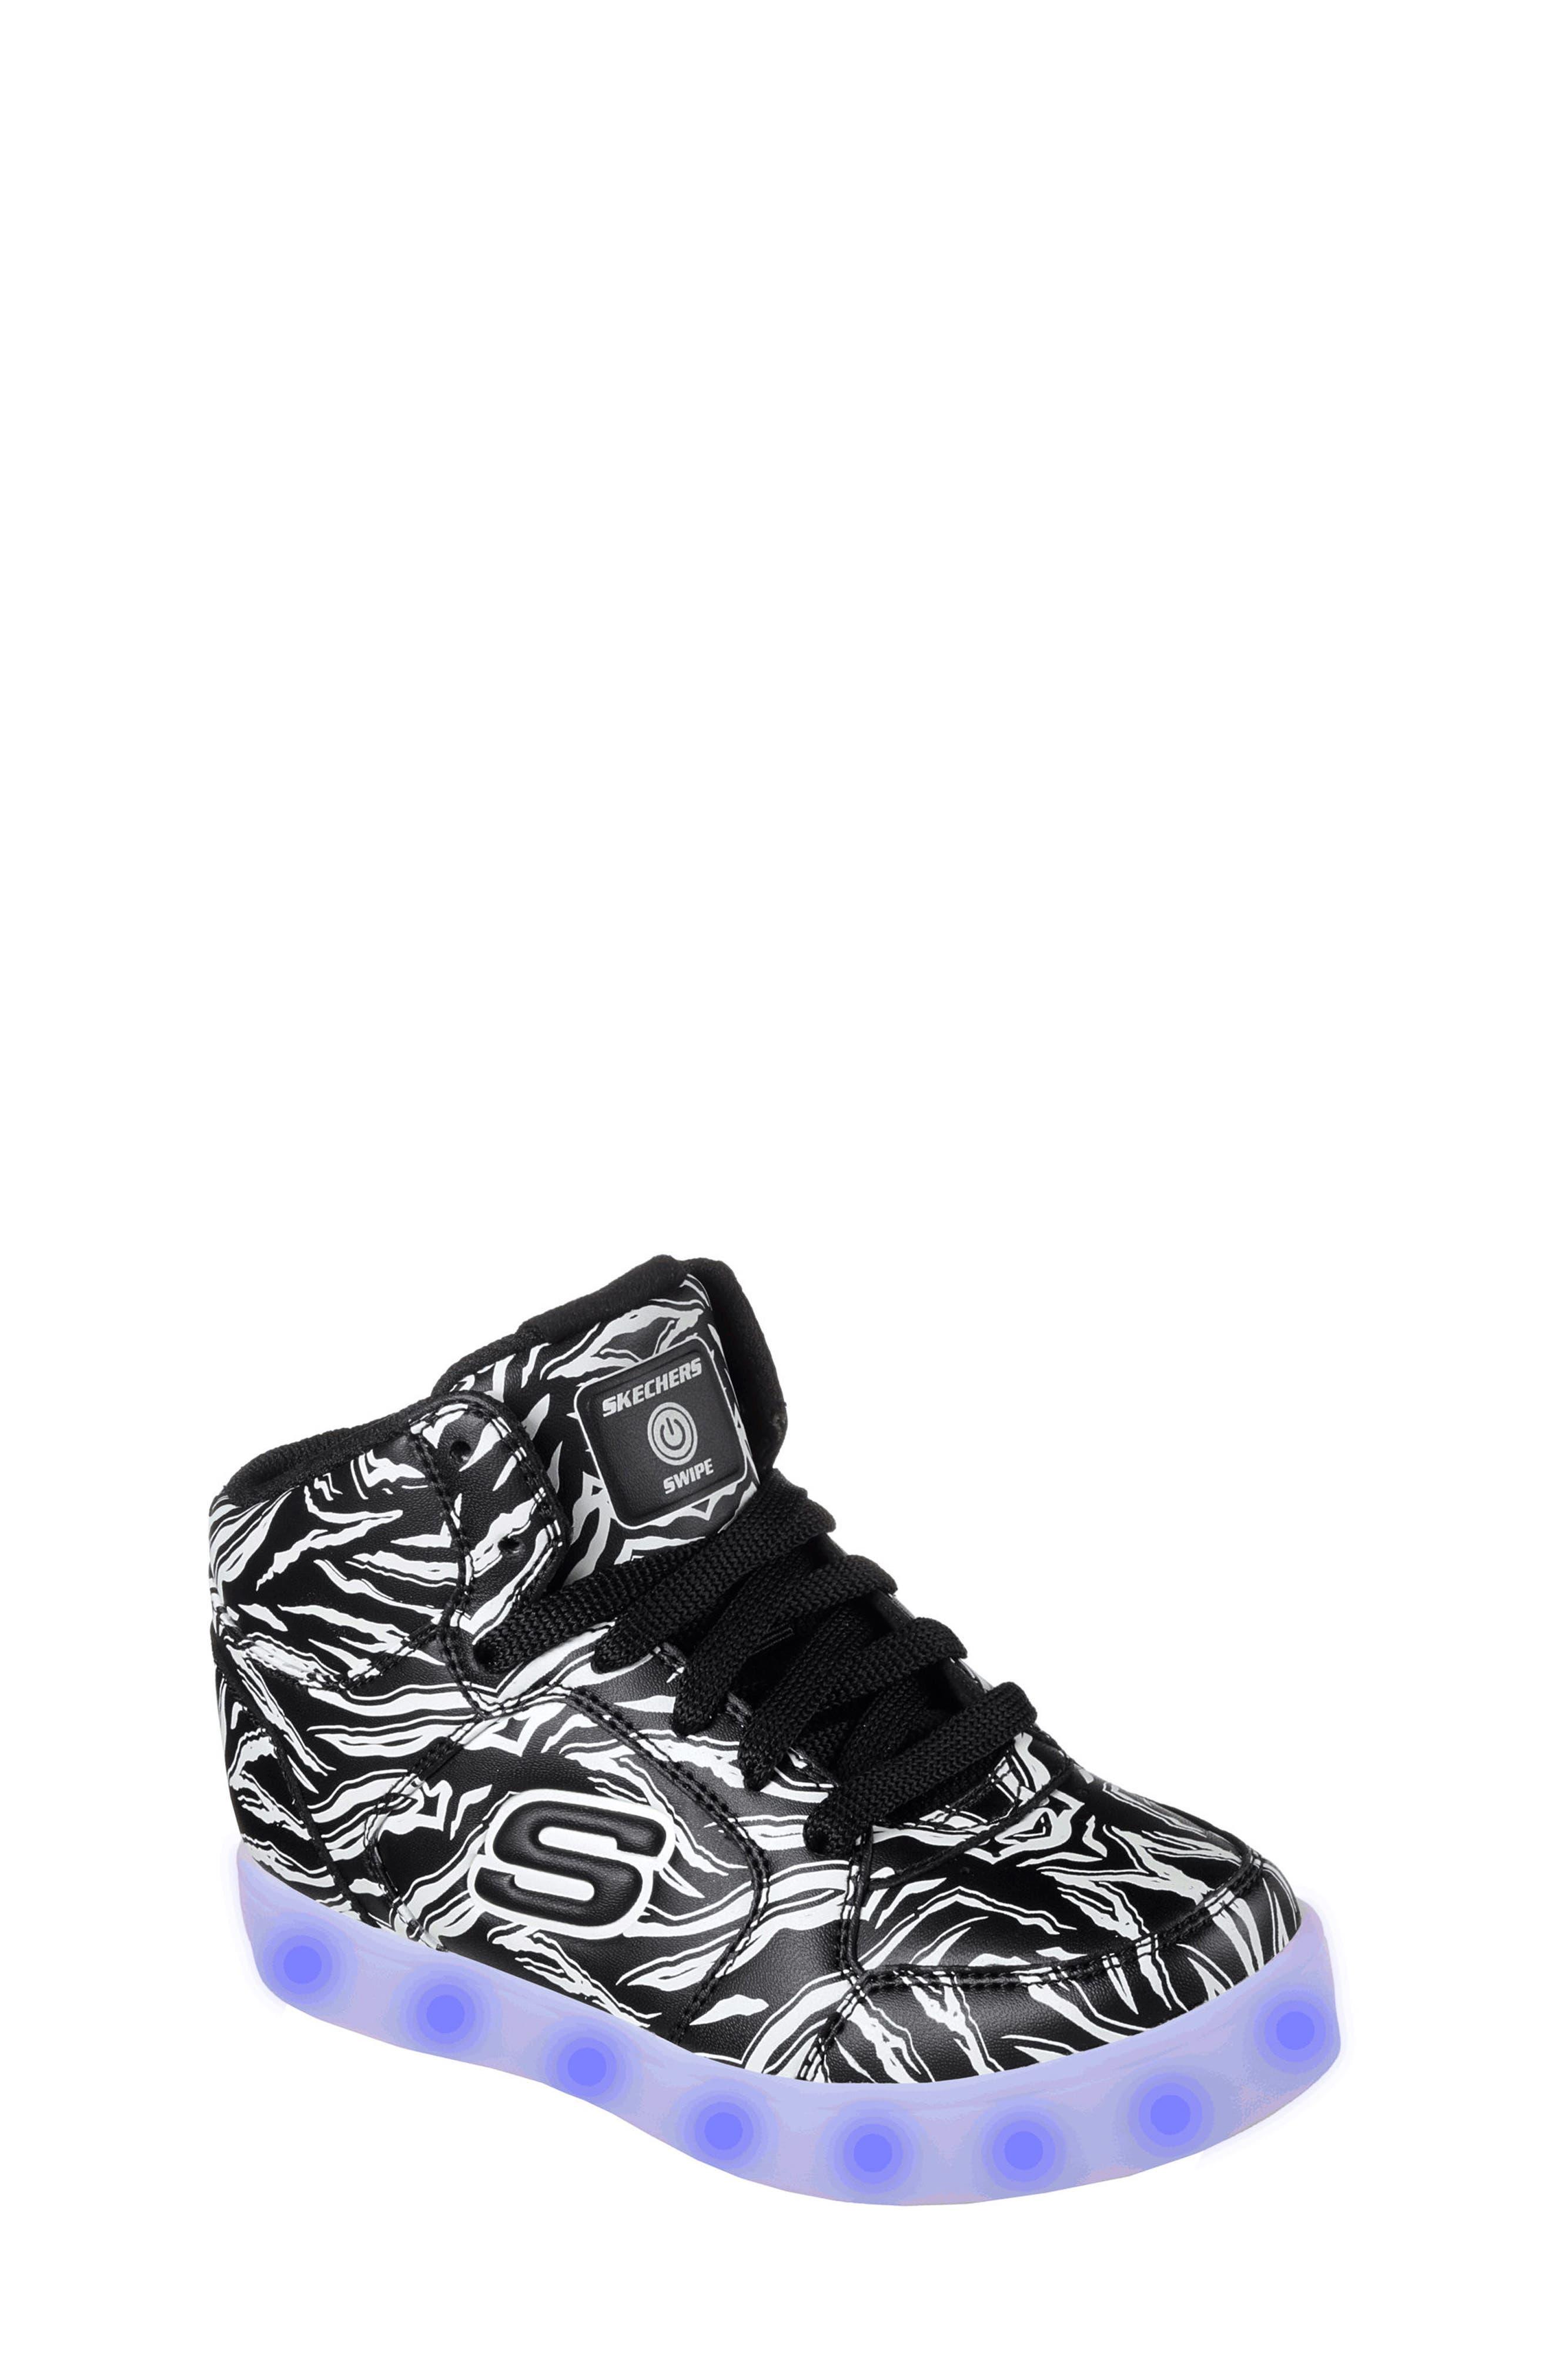 Energy Lights Glow in the Dark Sneaker,                             Alternate thumbnail 9, color,                             017